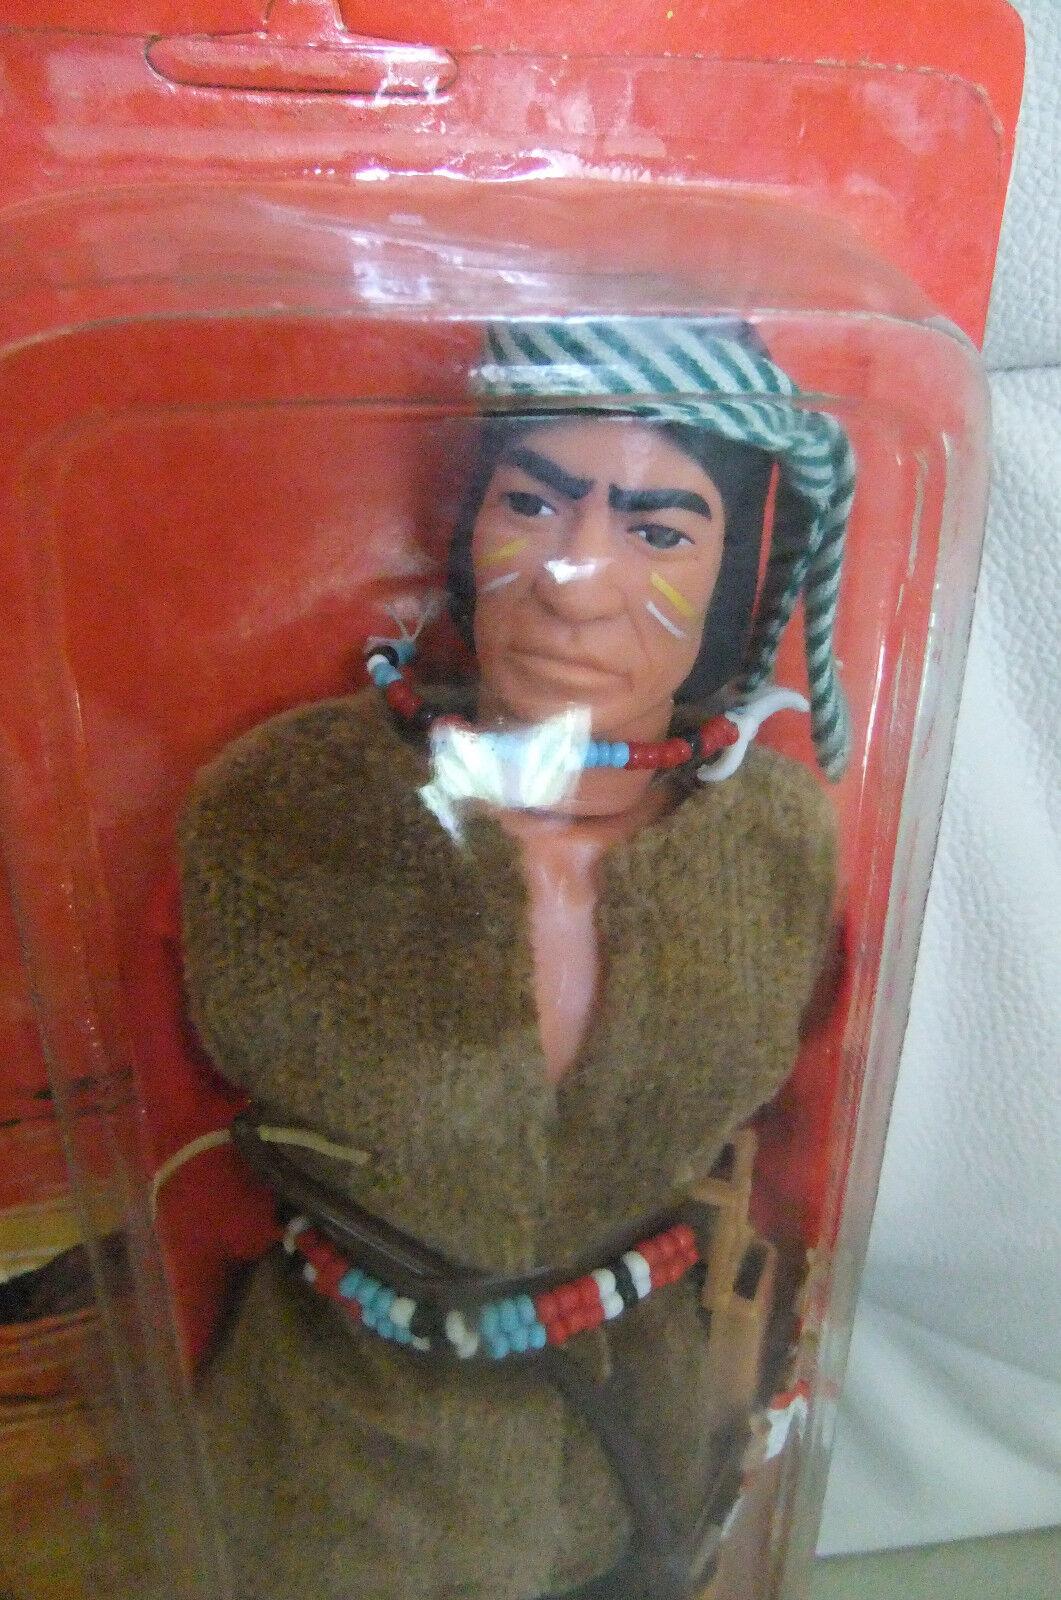 MIB MOC MOSC RED RED RED SLEVES FIGURINE MARX Lone Ranger GABRIEL 1973  1 NRFB 49ee32